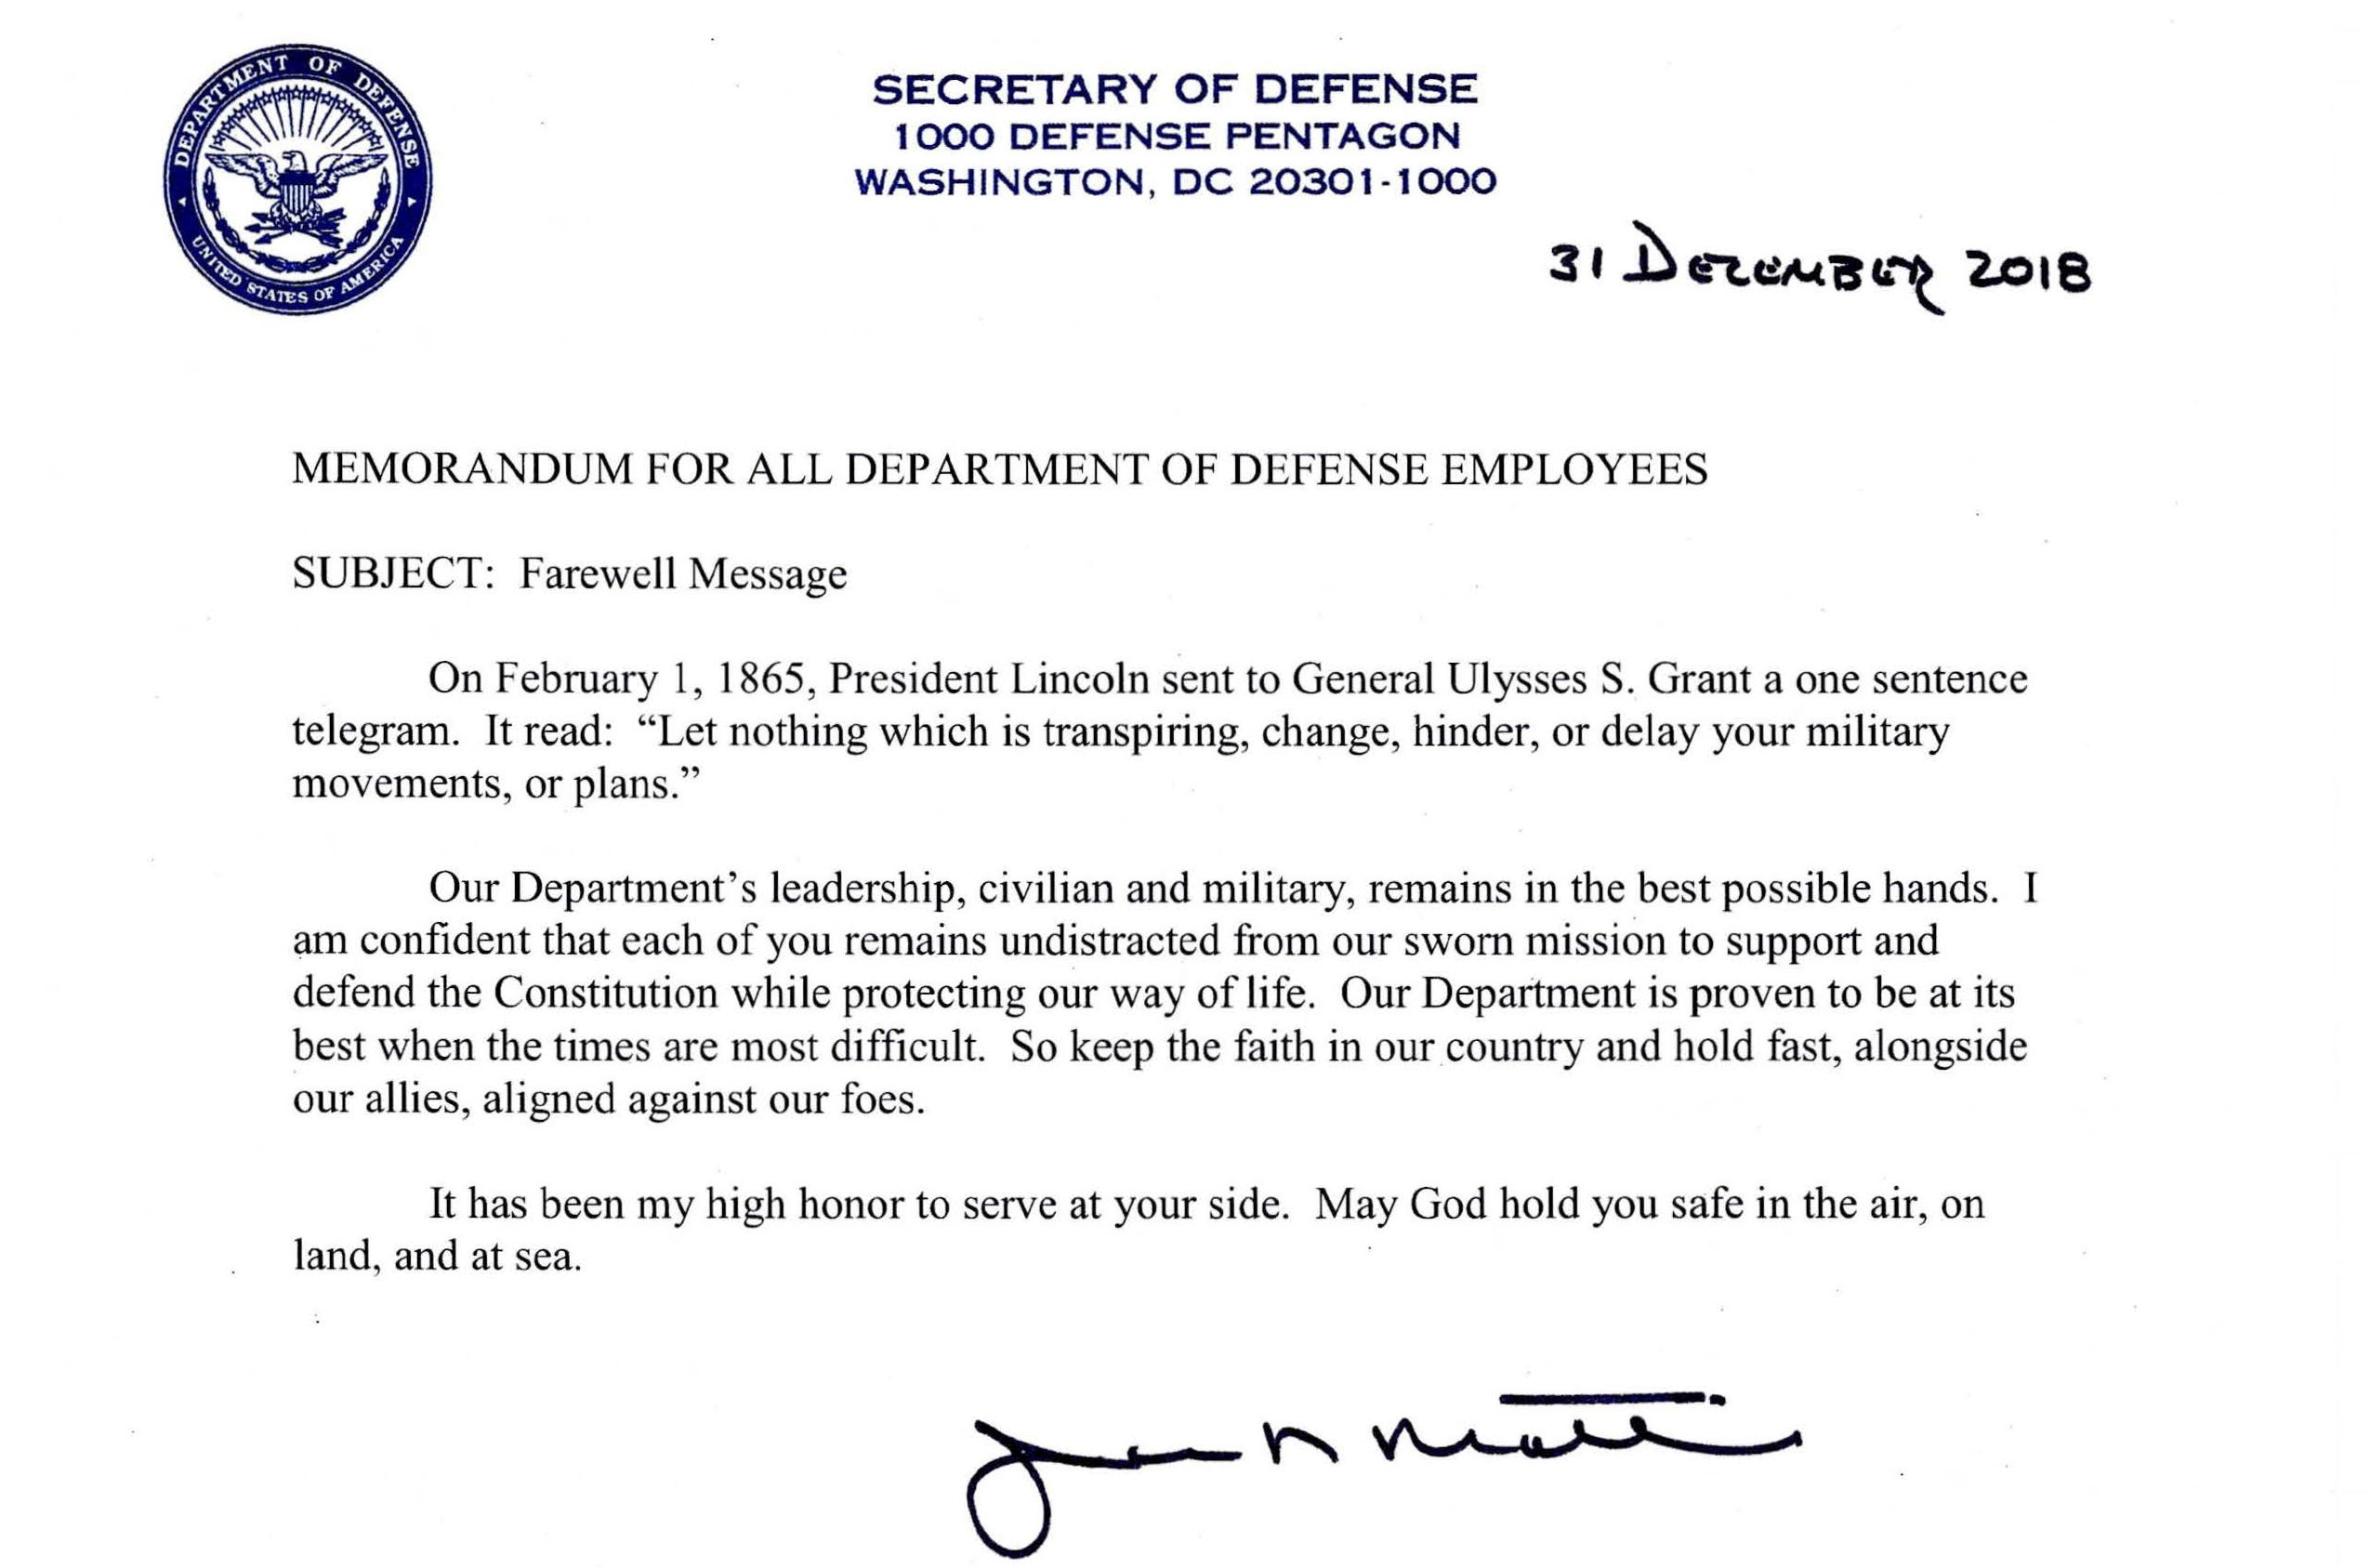 Defense Secretary Jim Mattis' farewell message from Dec. 31, 2018.